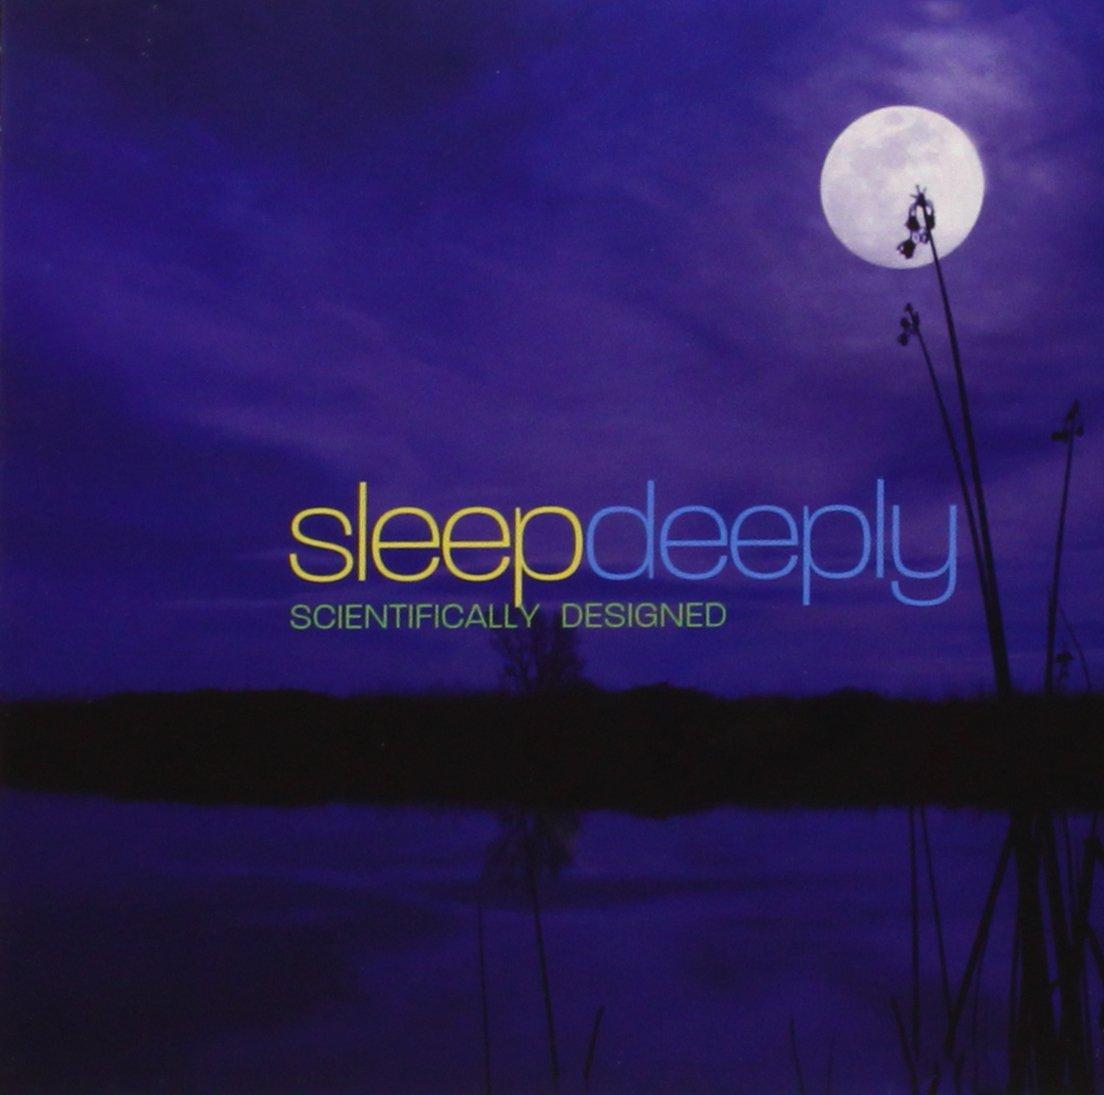 Sleep Deeply by Solitudes